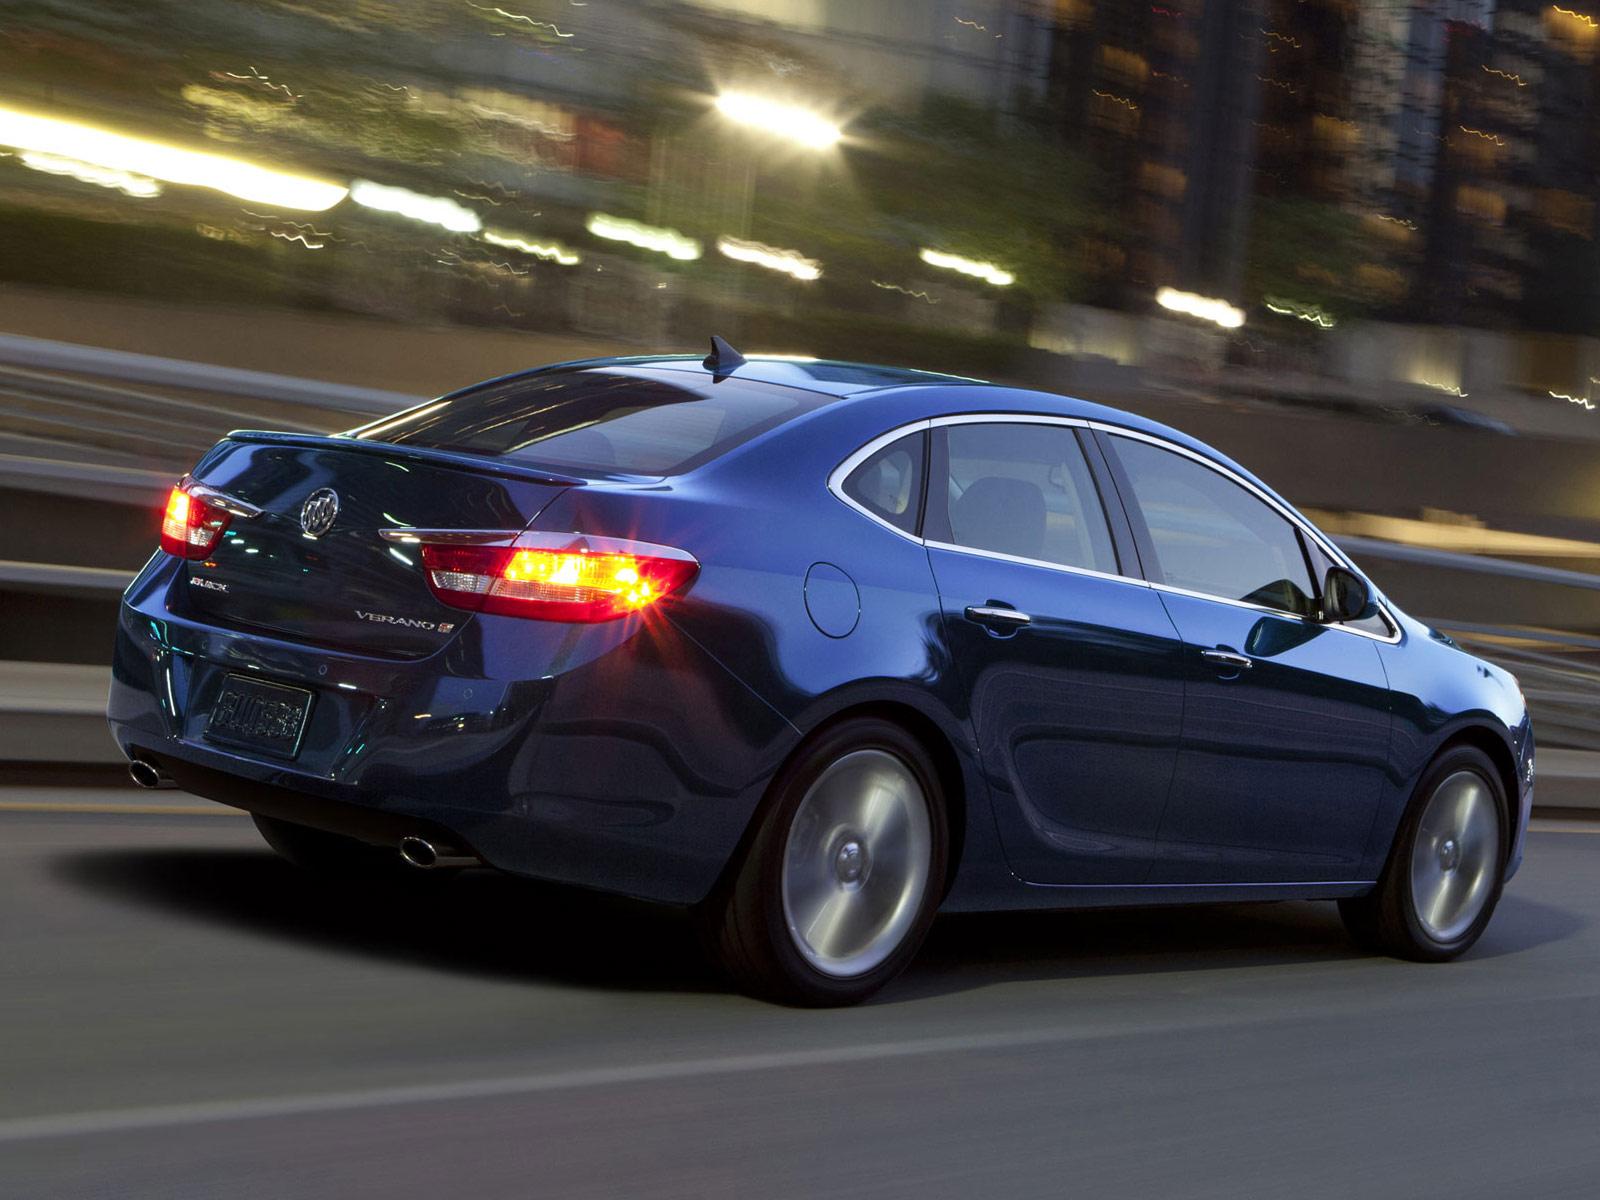 2013 Buick Verano Turbo CAR Insurance Information